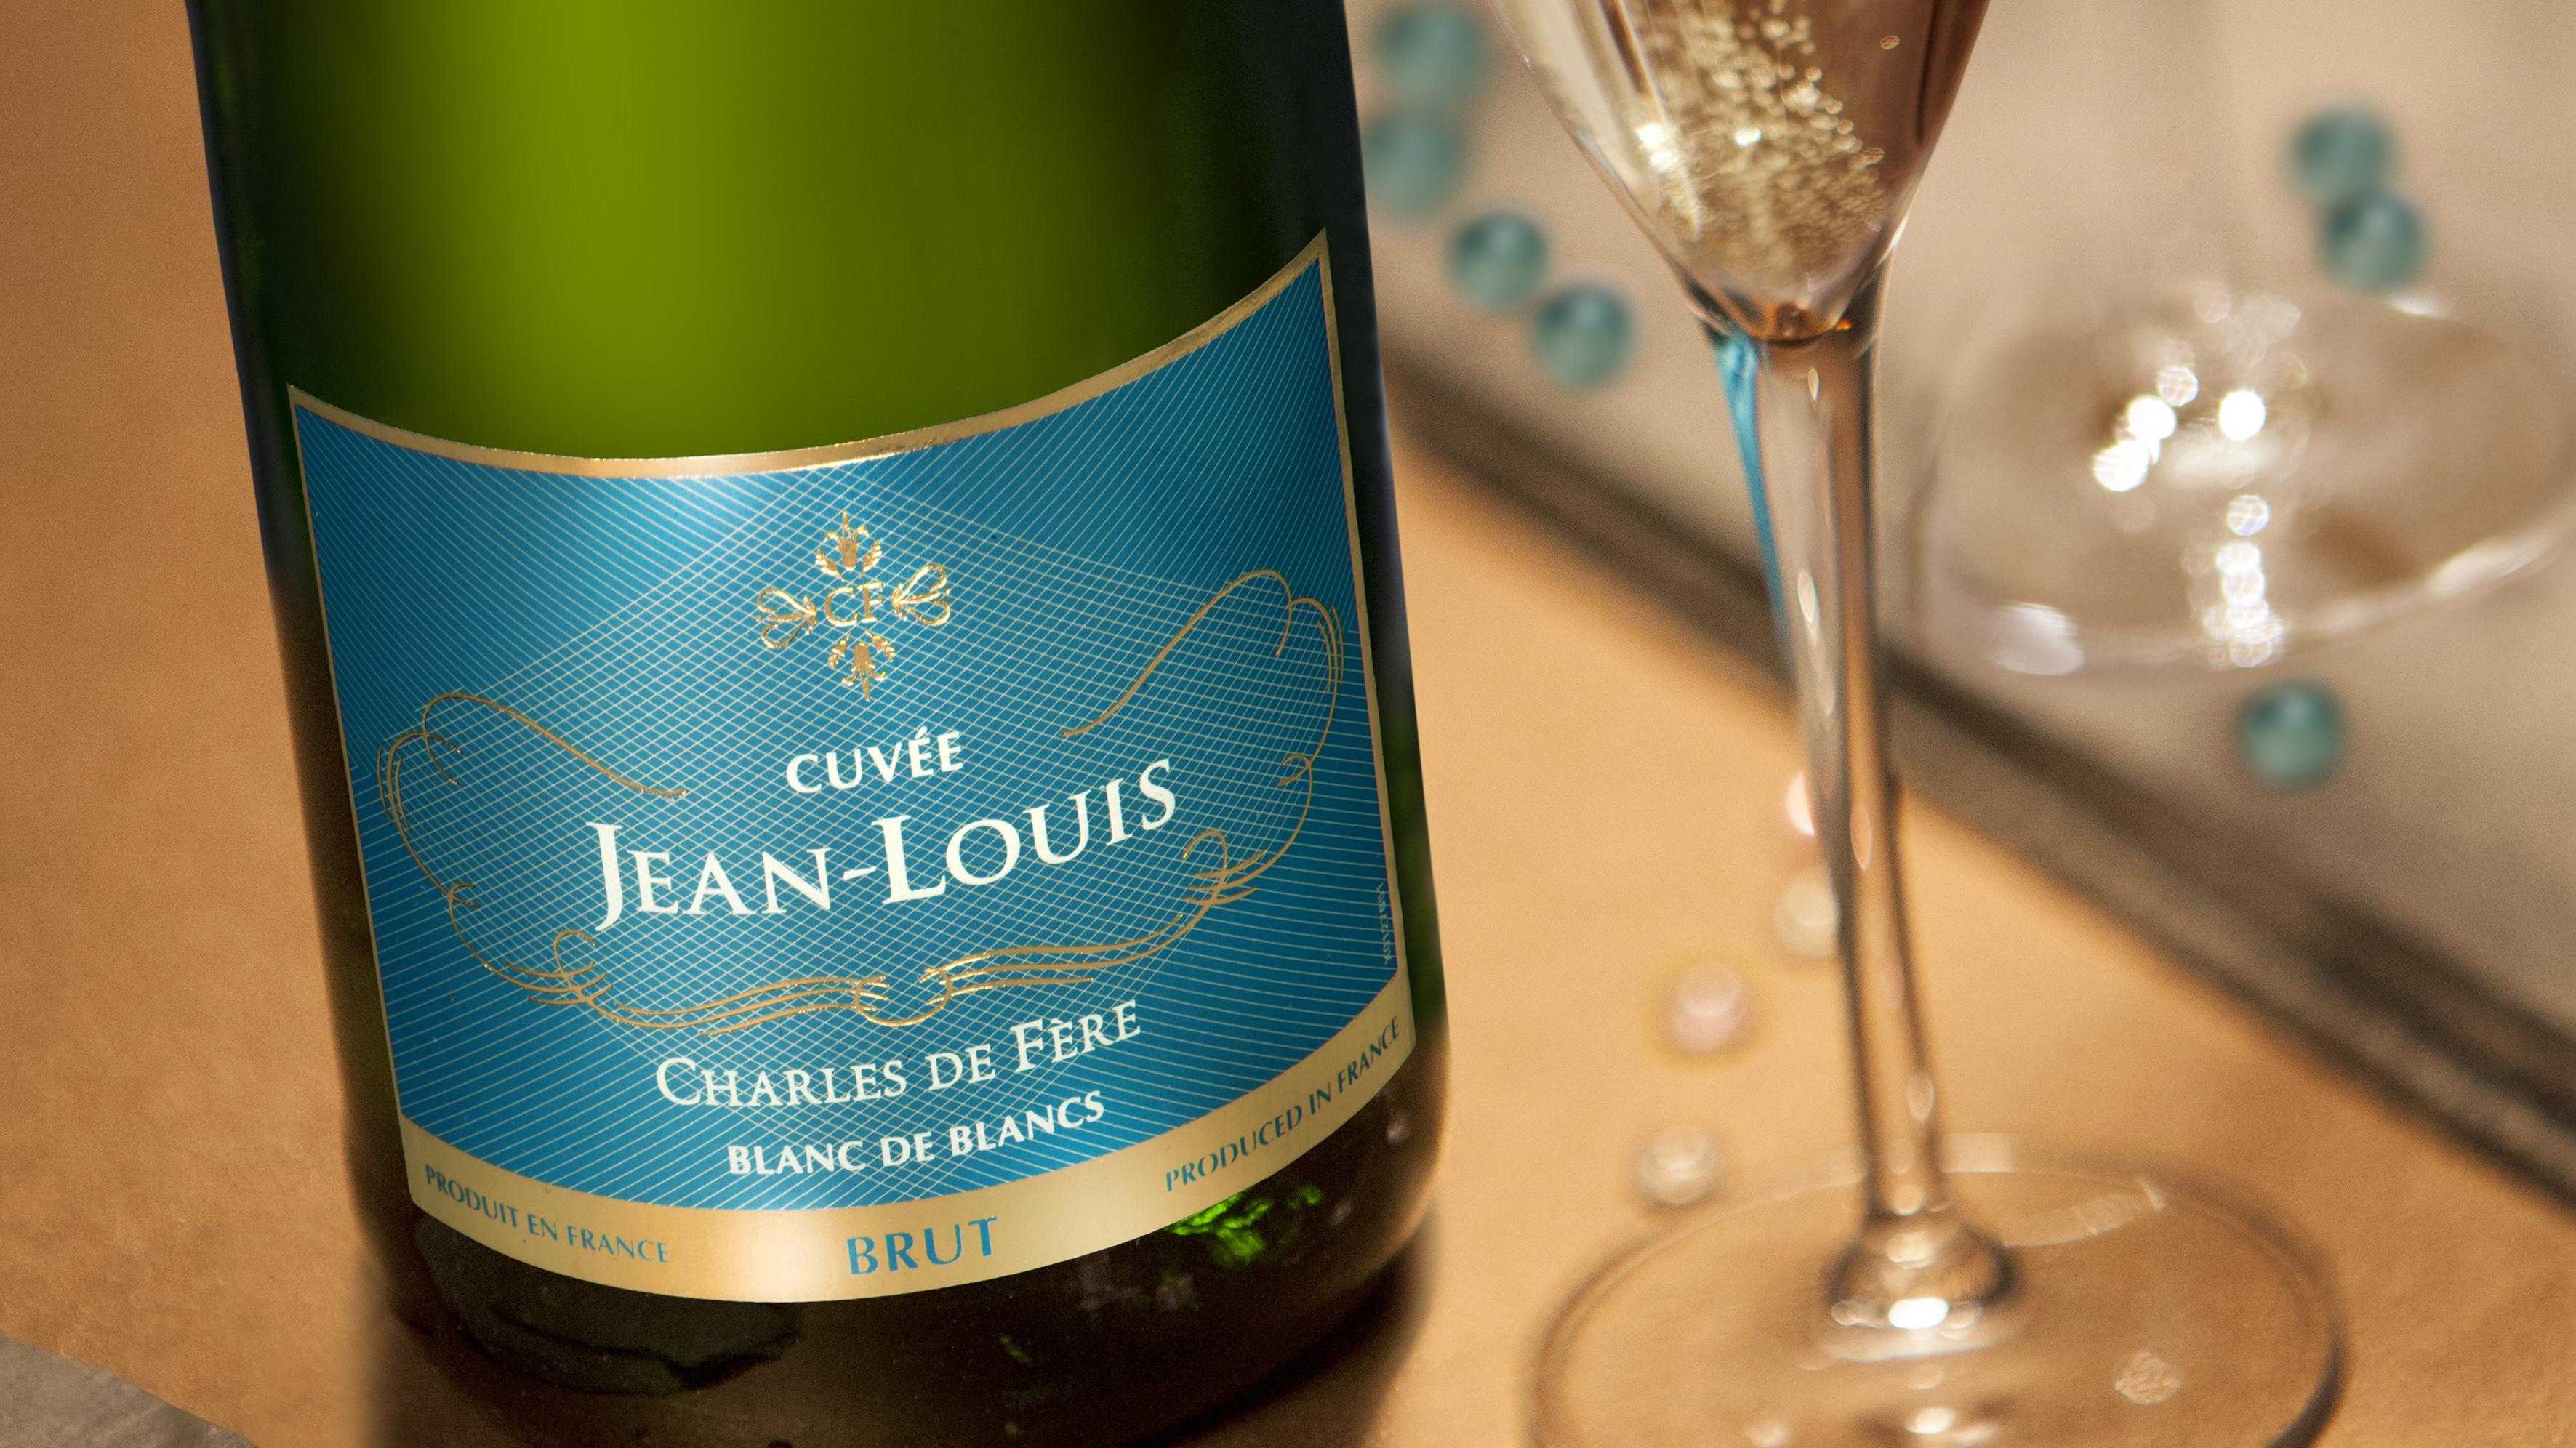 Charles de Fere, Cuvee Jean Louis